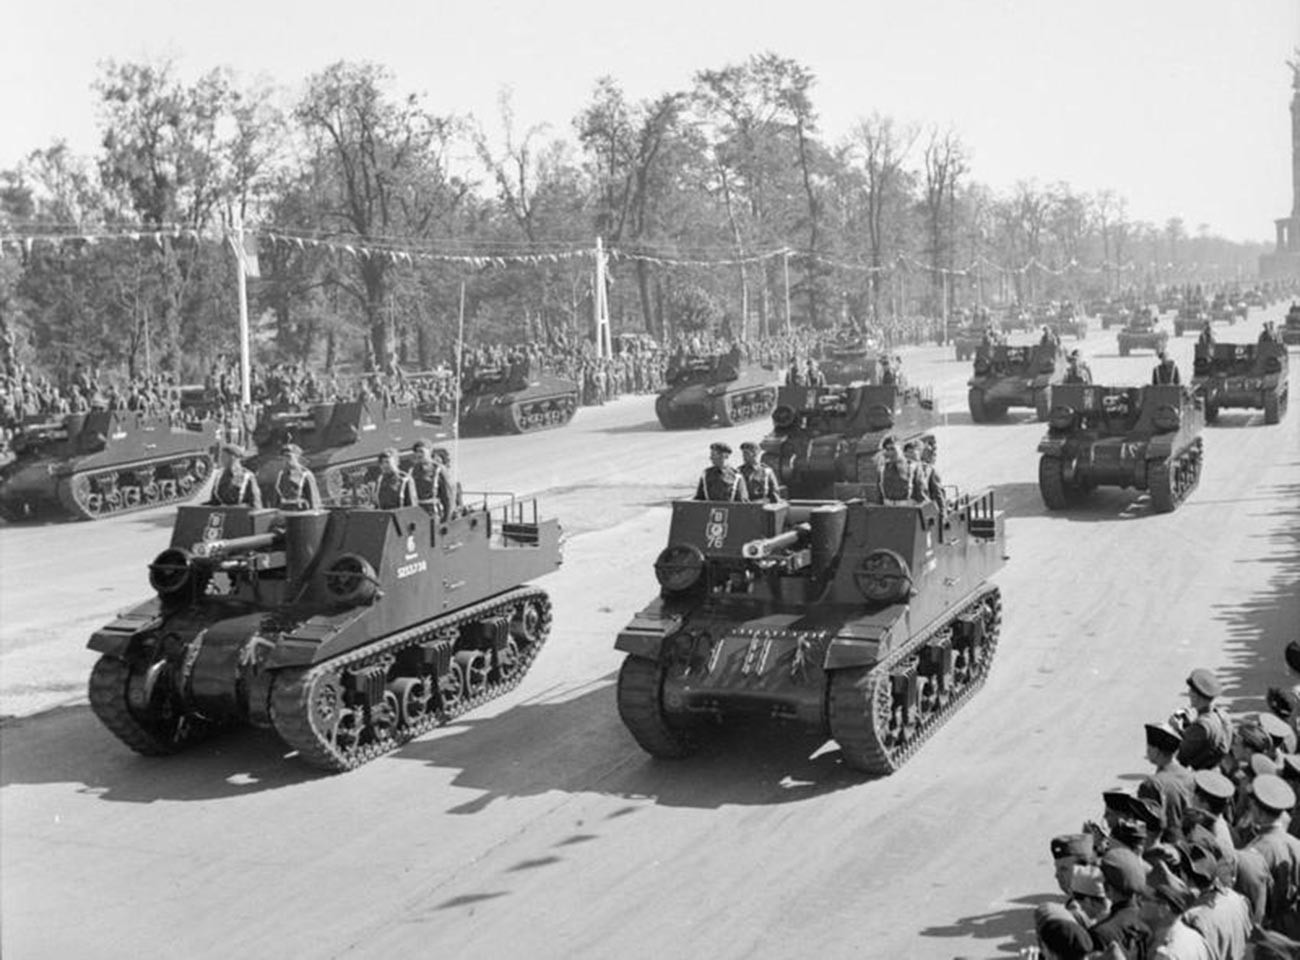 Canhões autopropulsados Sexton britânicos durante o desfile de 7 de setembro